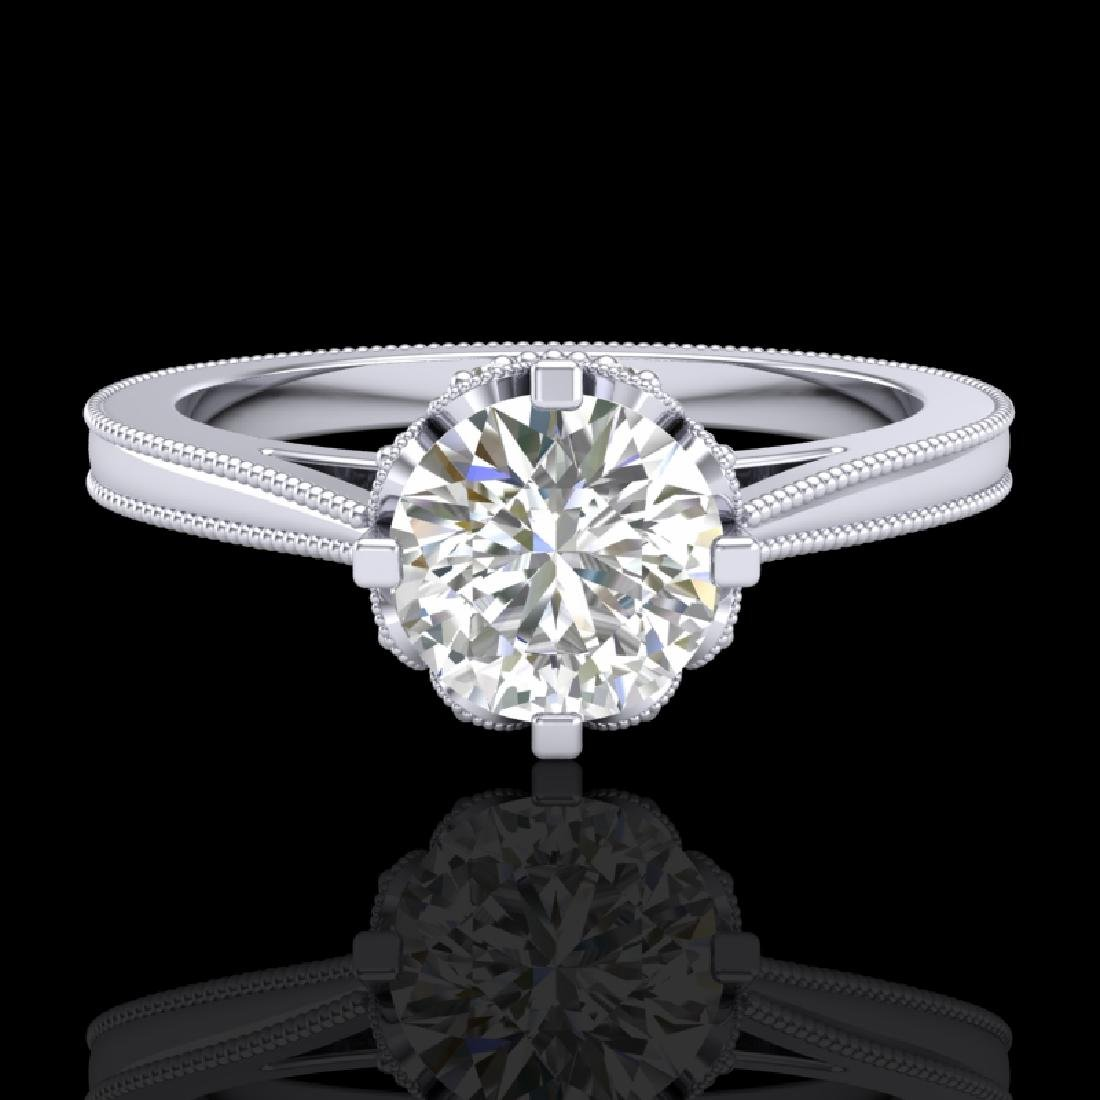 1.14 CTW VS/SI Diamond Art Deco Ring 18K White Gold - 2